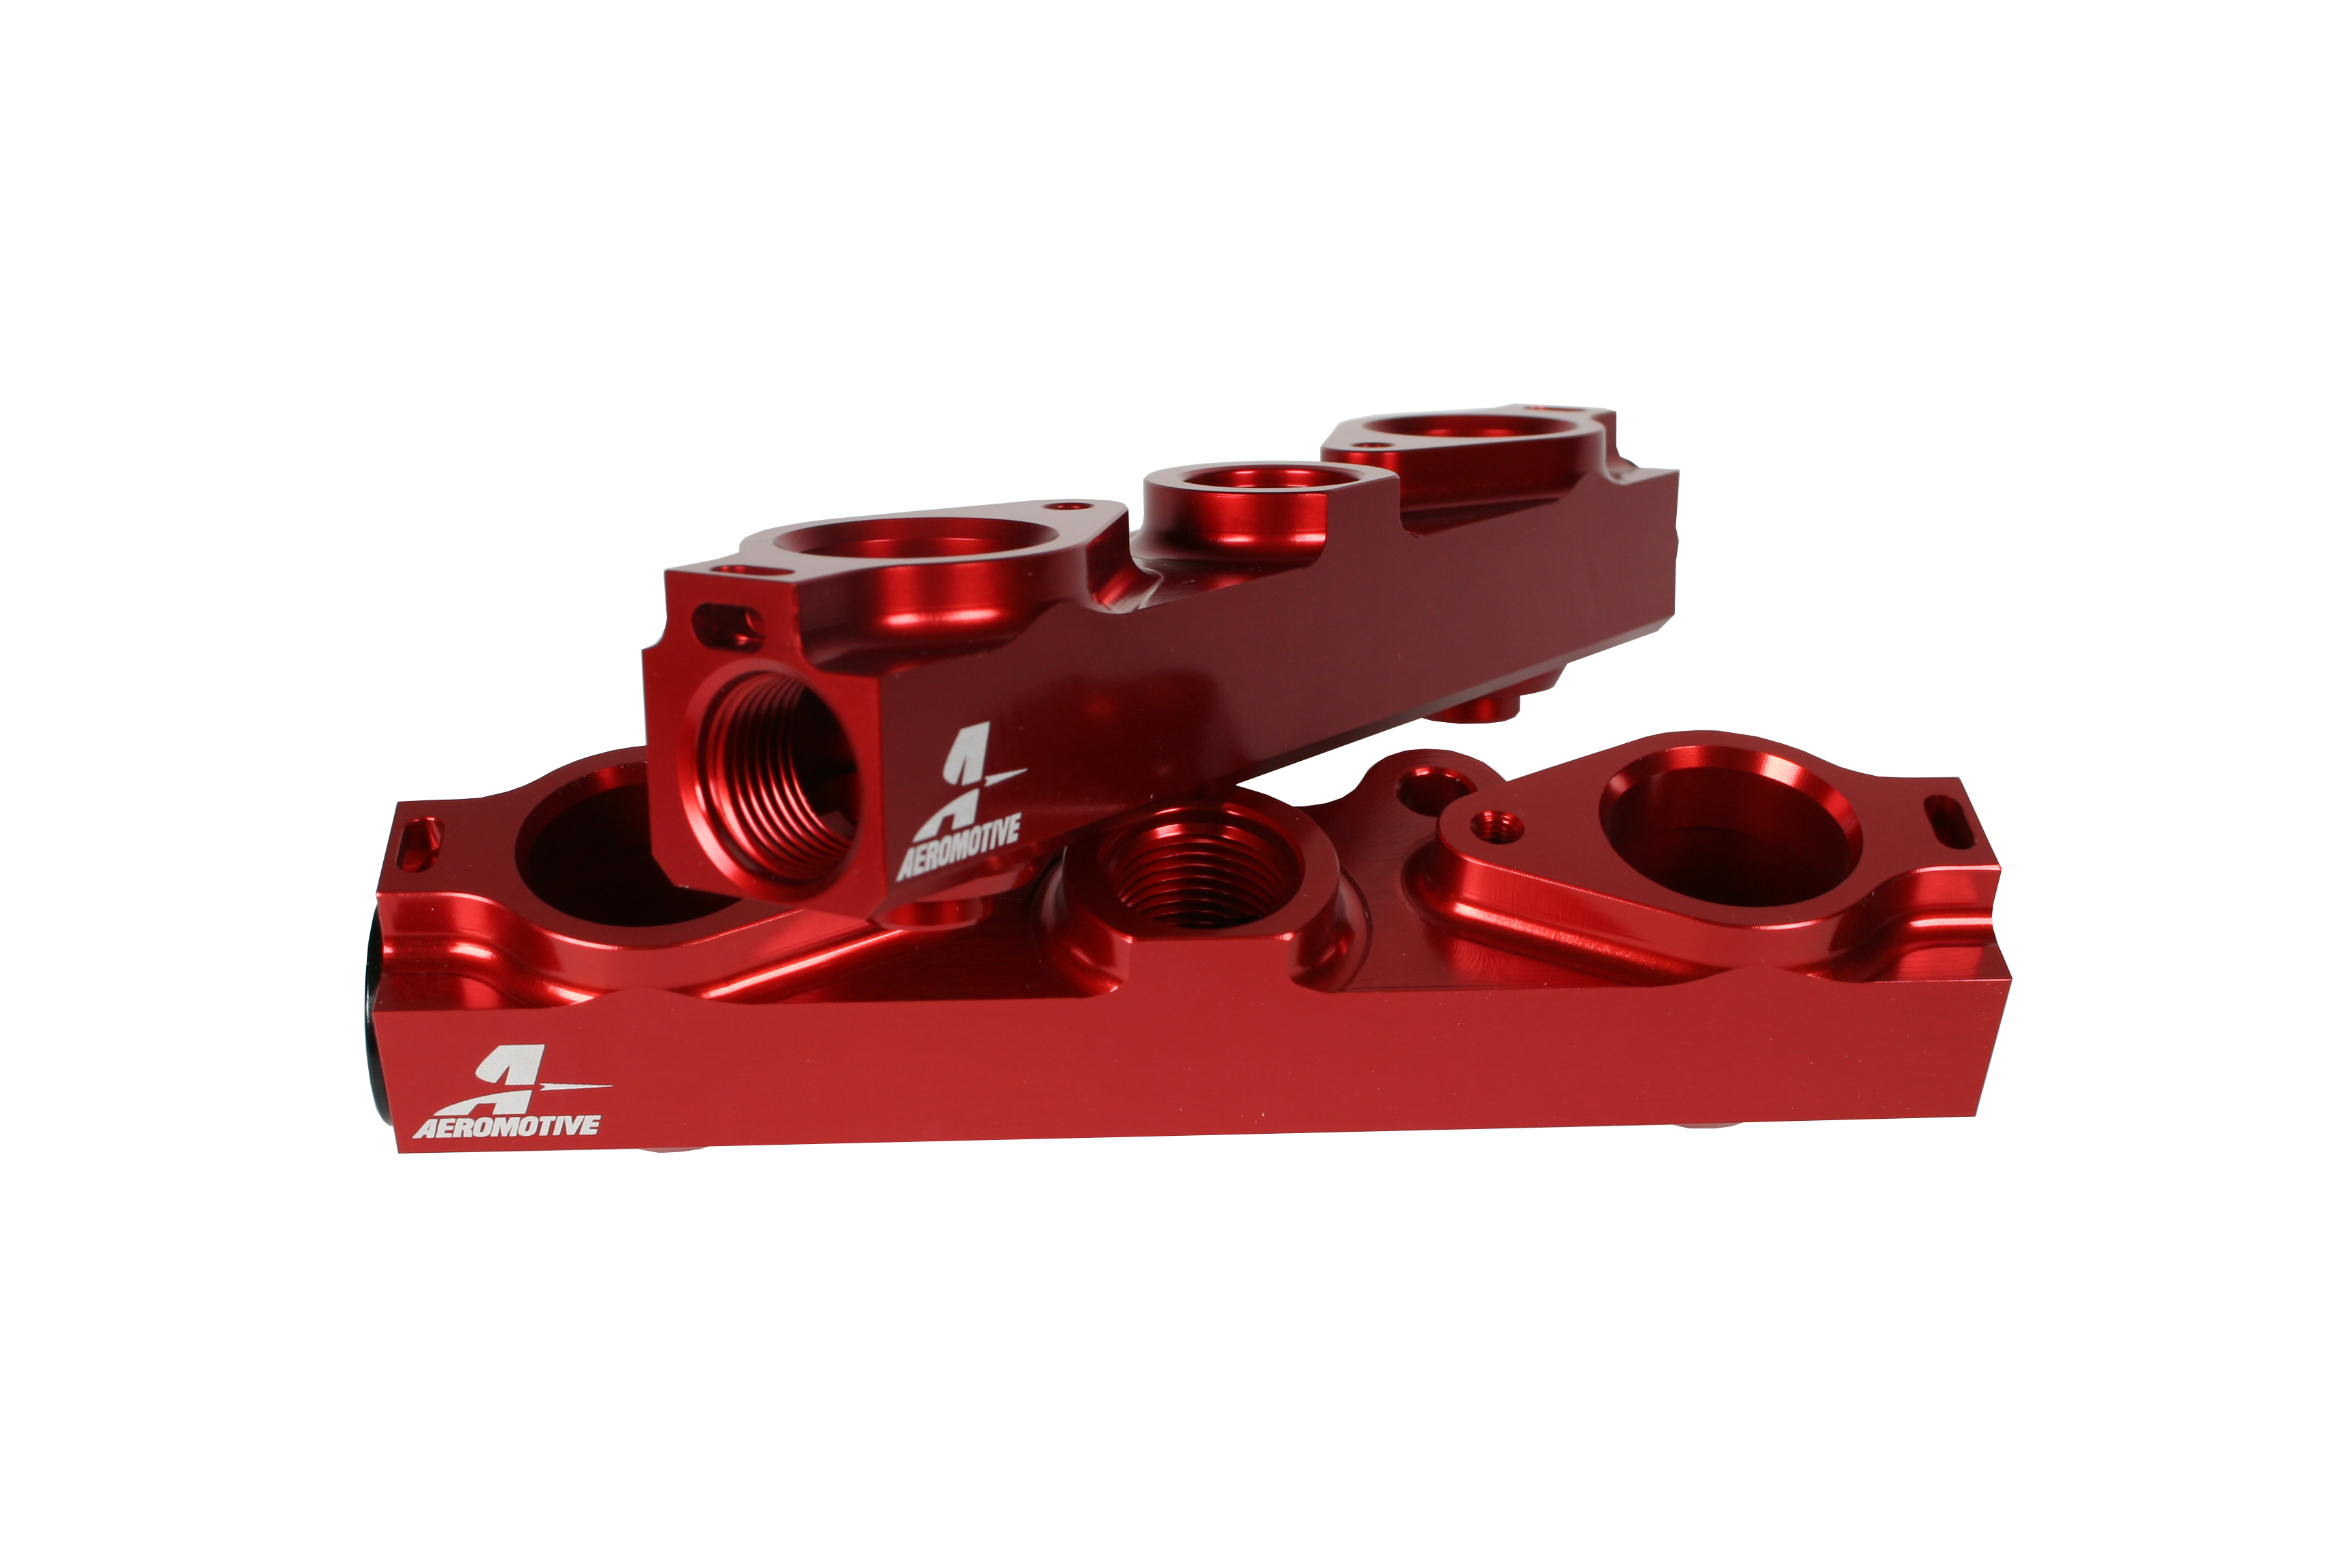 04 06 Subaru 25l Sti Fuel Rail Kit Aeromotive Inc 2006 Filter Location